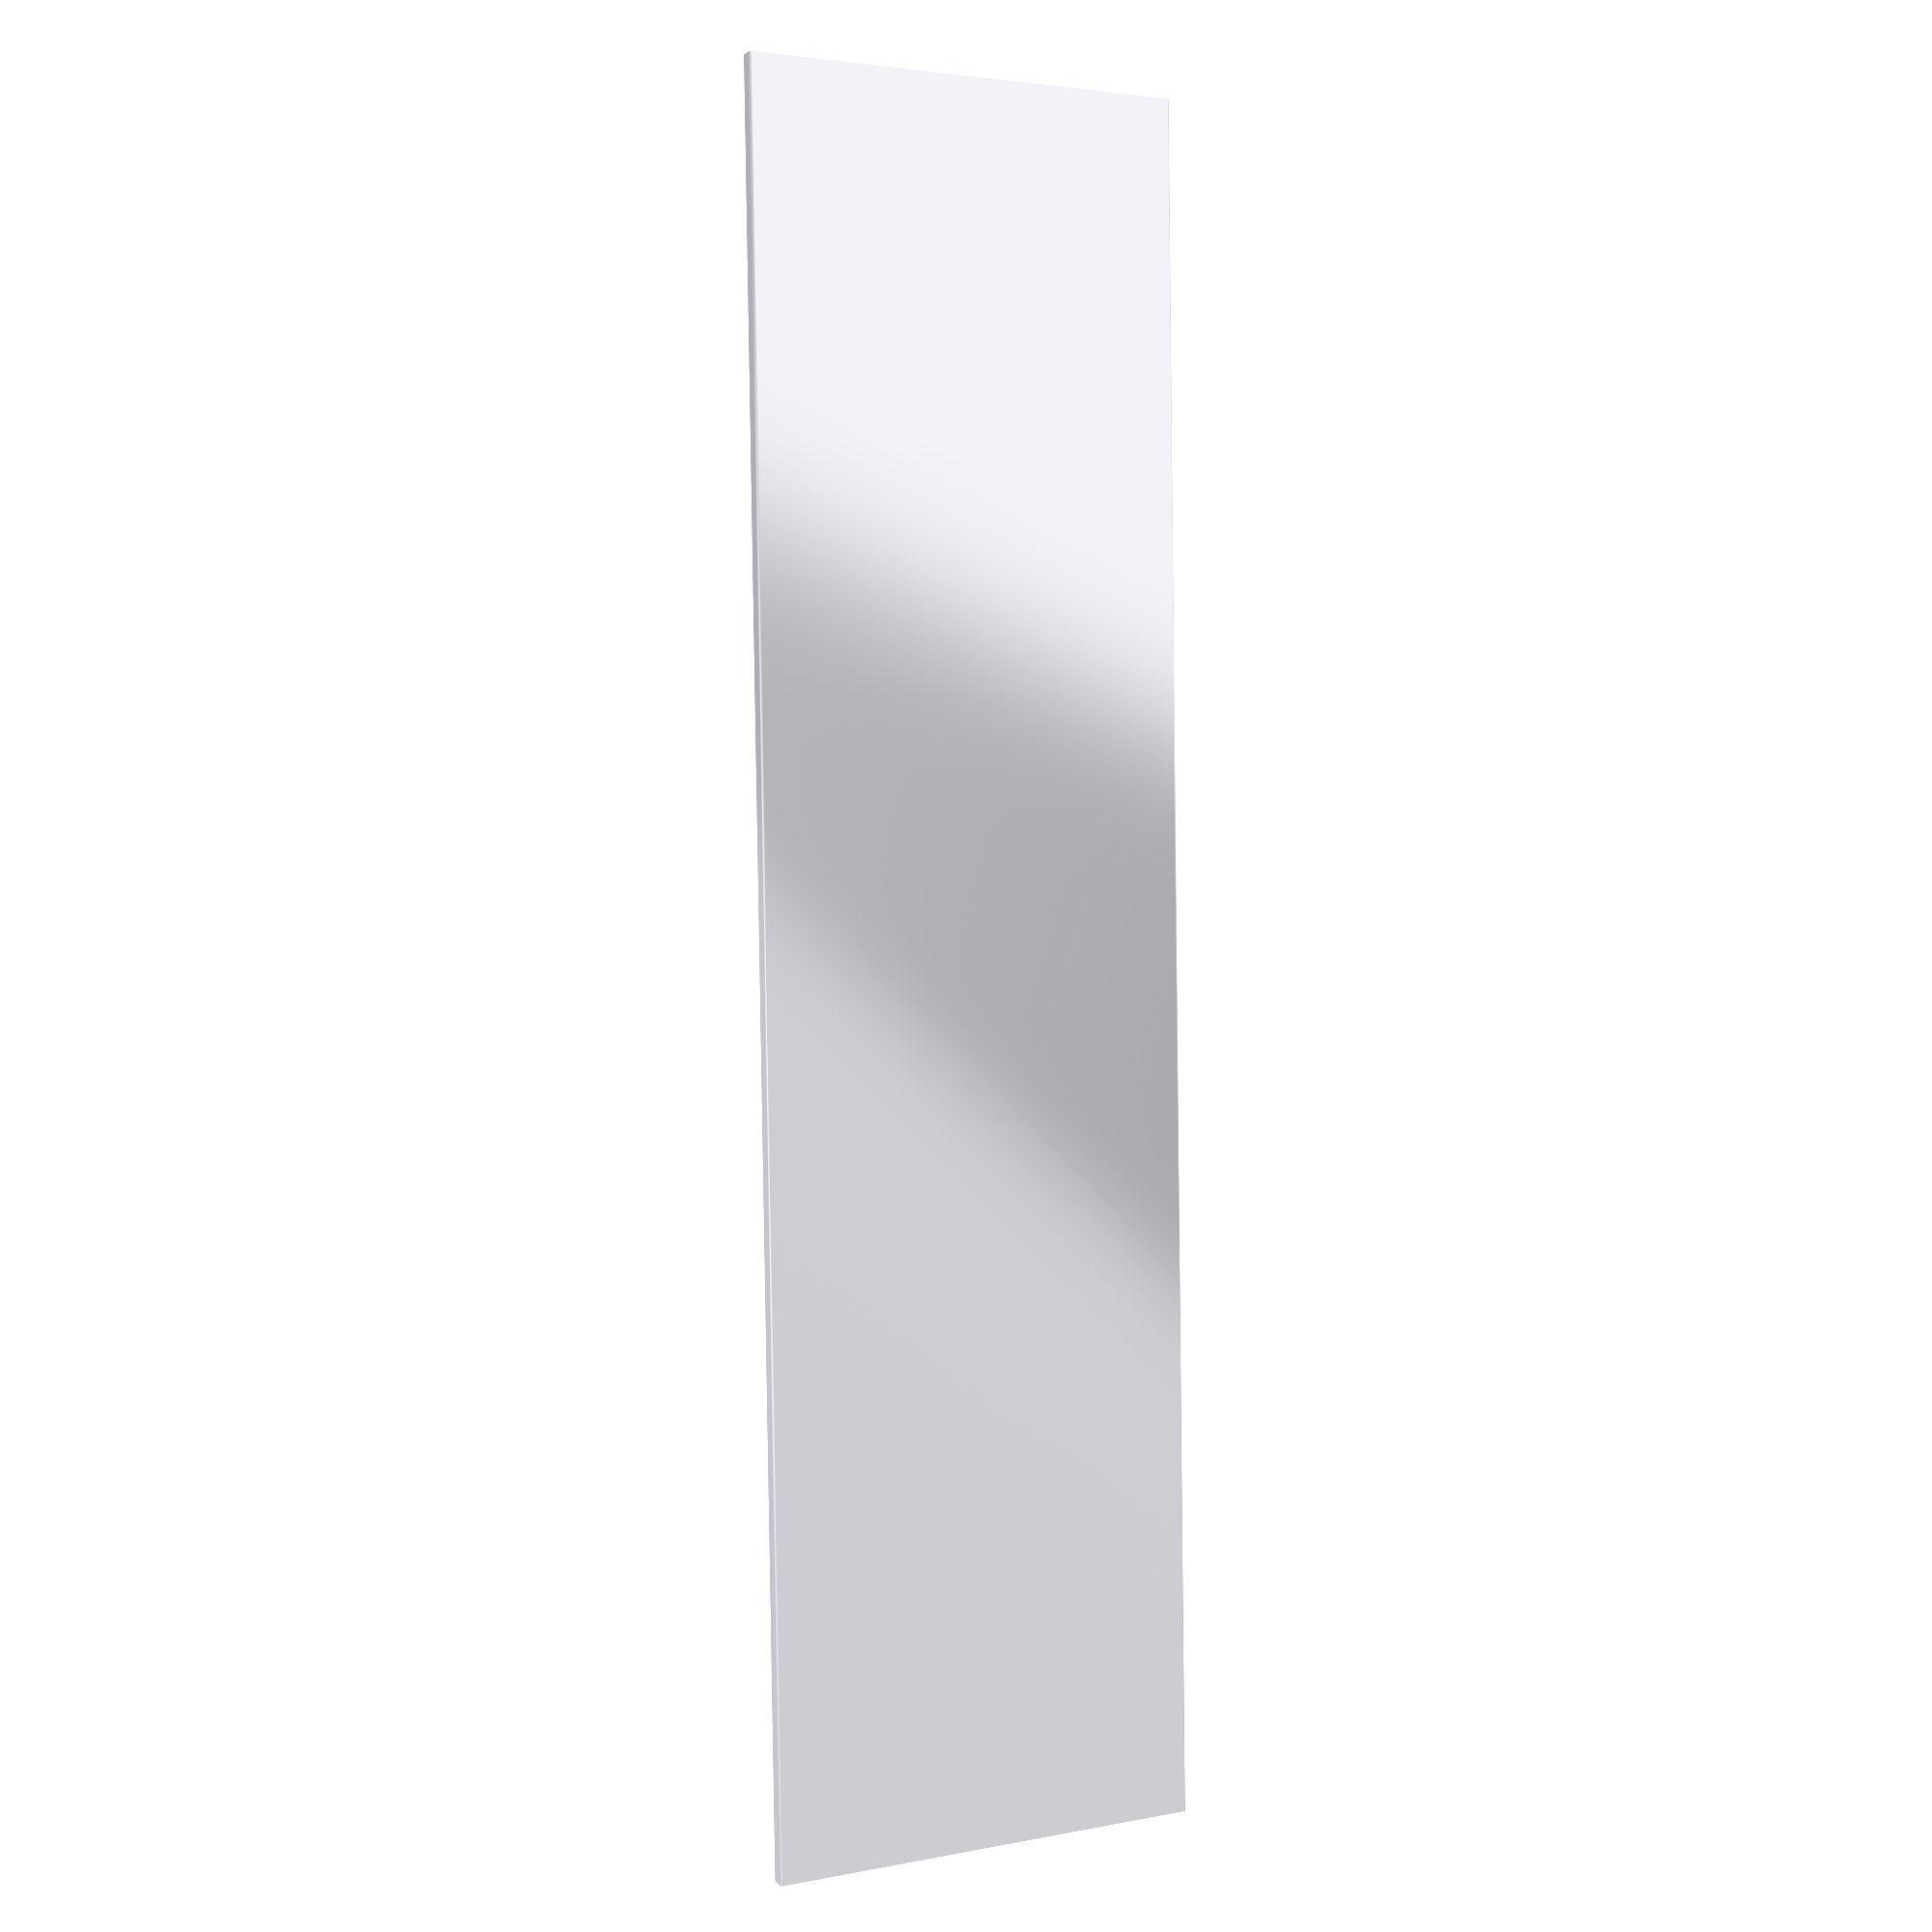 Darwin Modular Wardrobe Door (h)1936mm (w)497mm